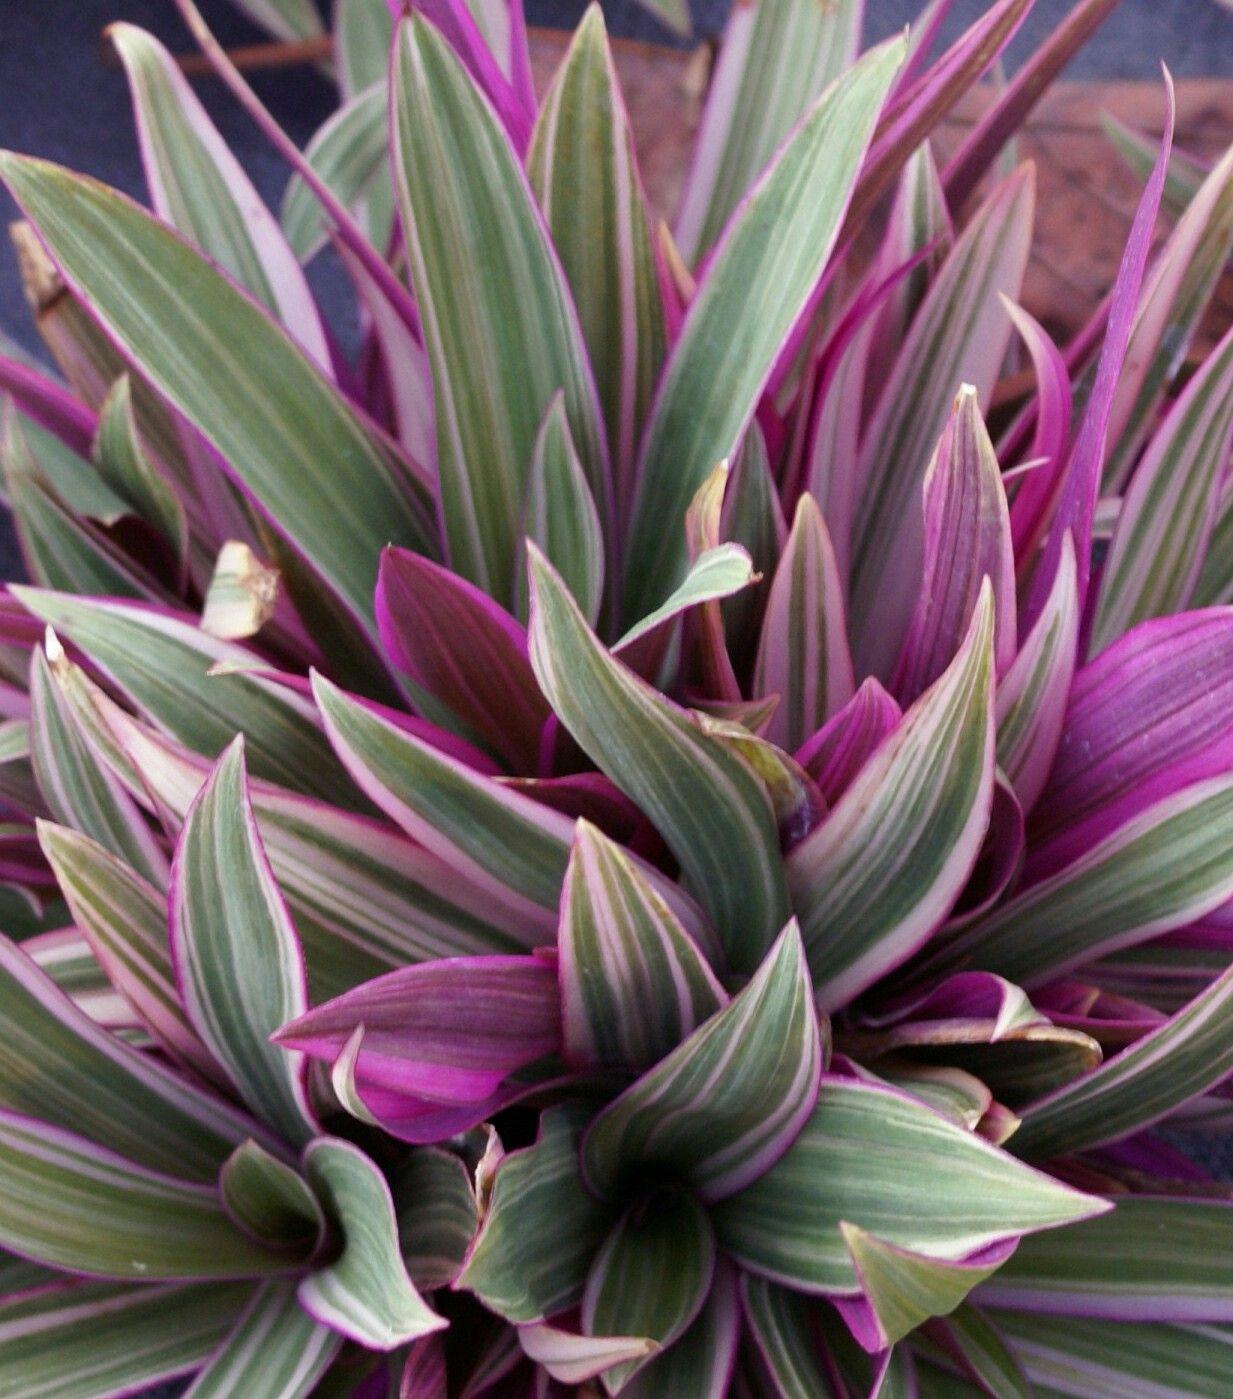 Roeo 'Stripe Me Pink' | Plants, Succulents, Ornamental grasses